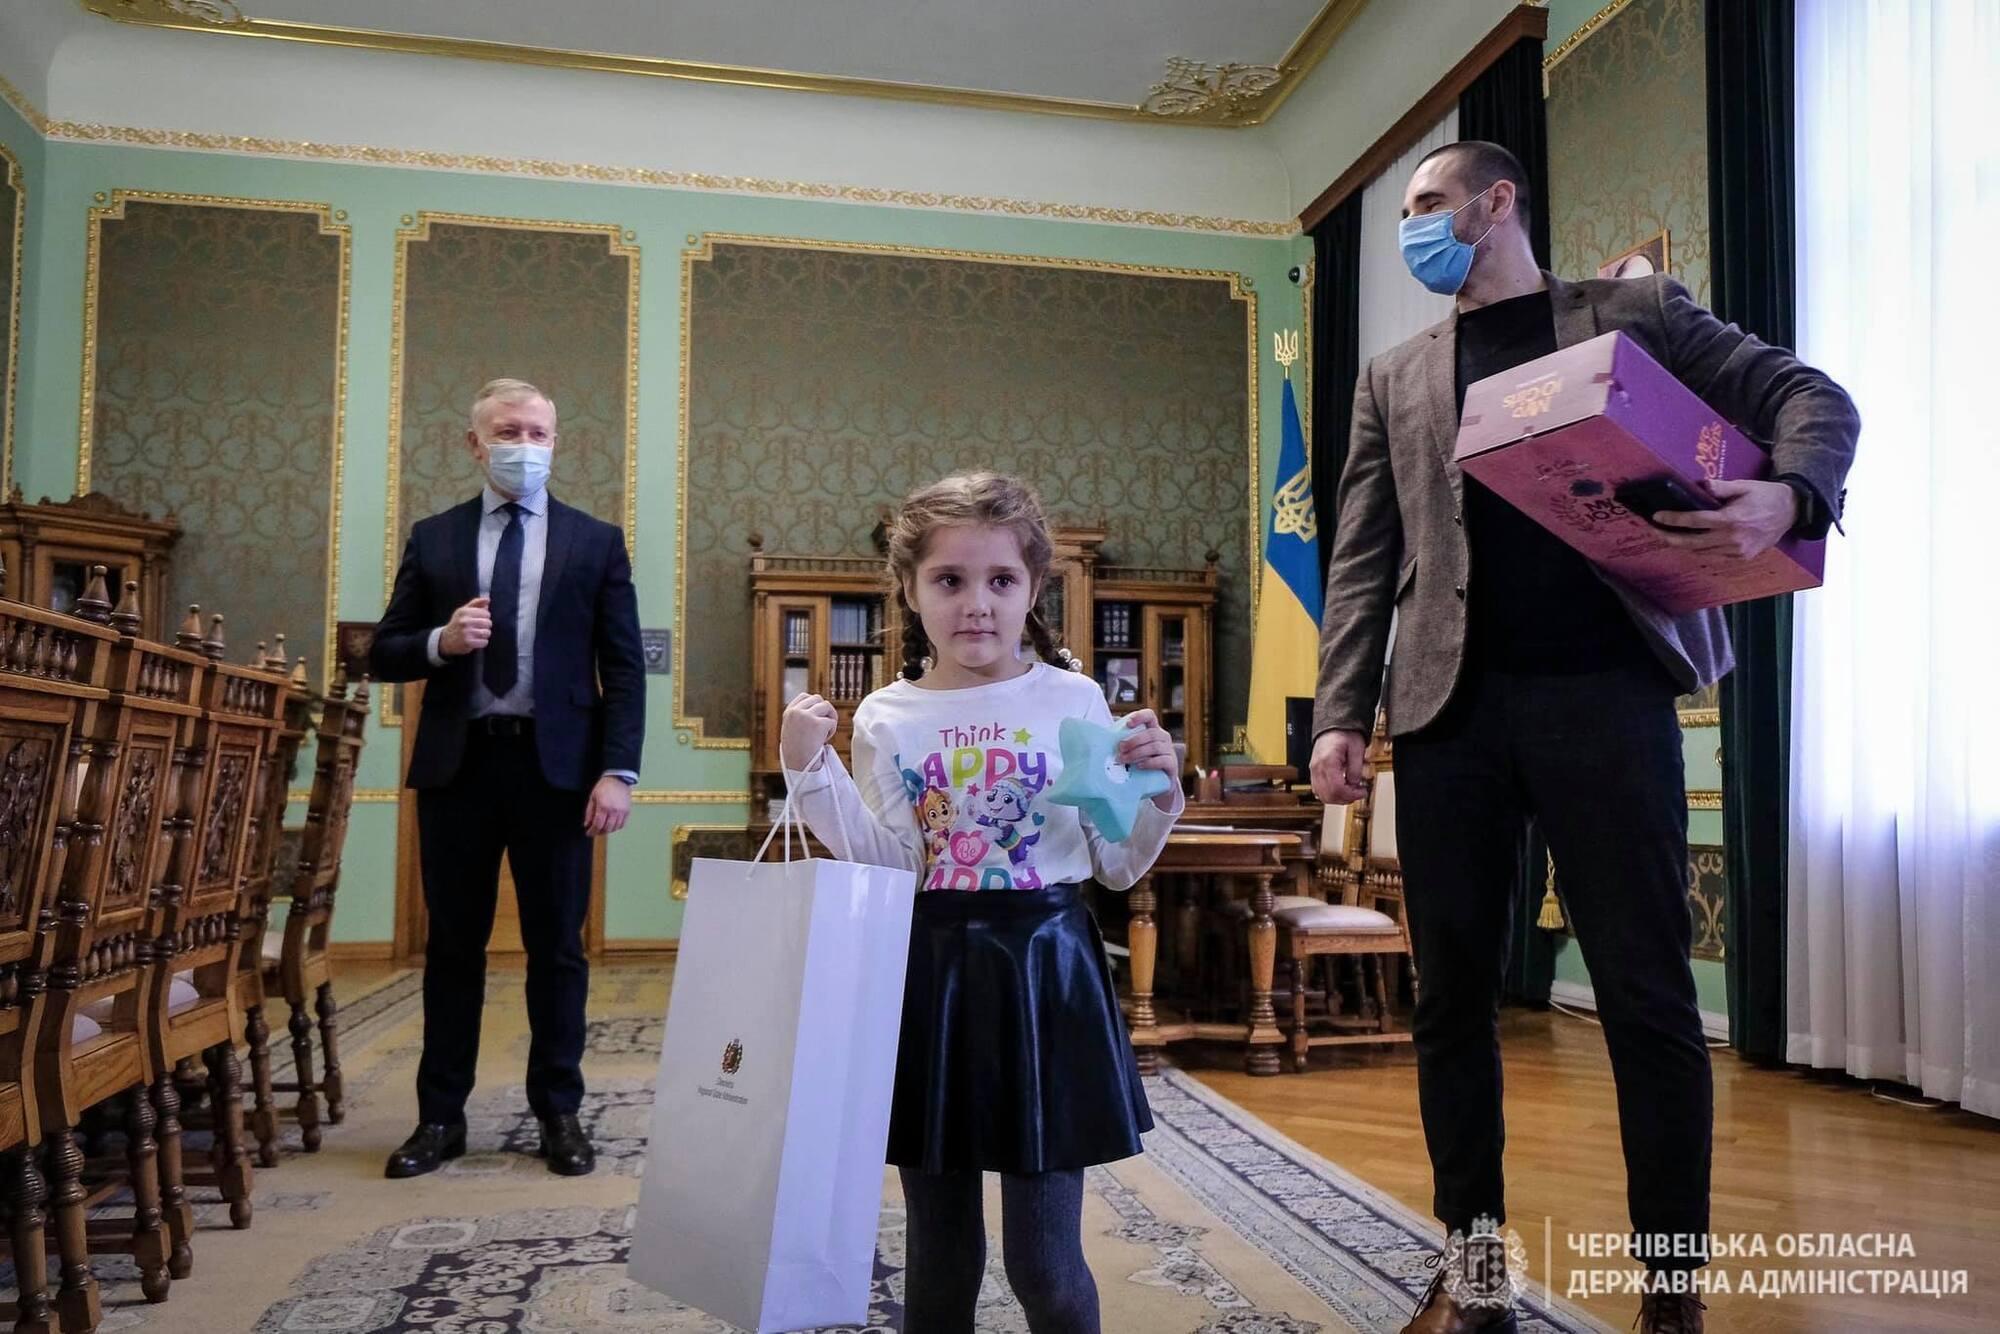 Отец девочки поблагодарил президента за реакцию.